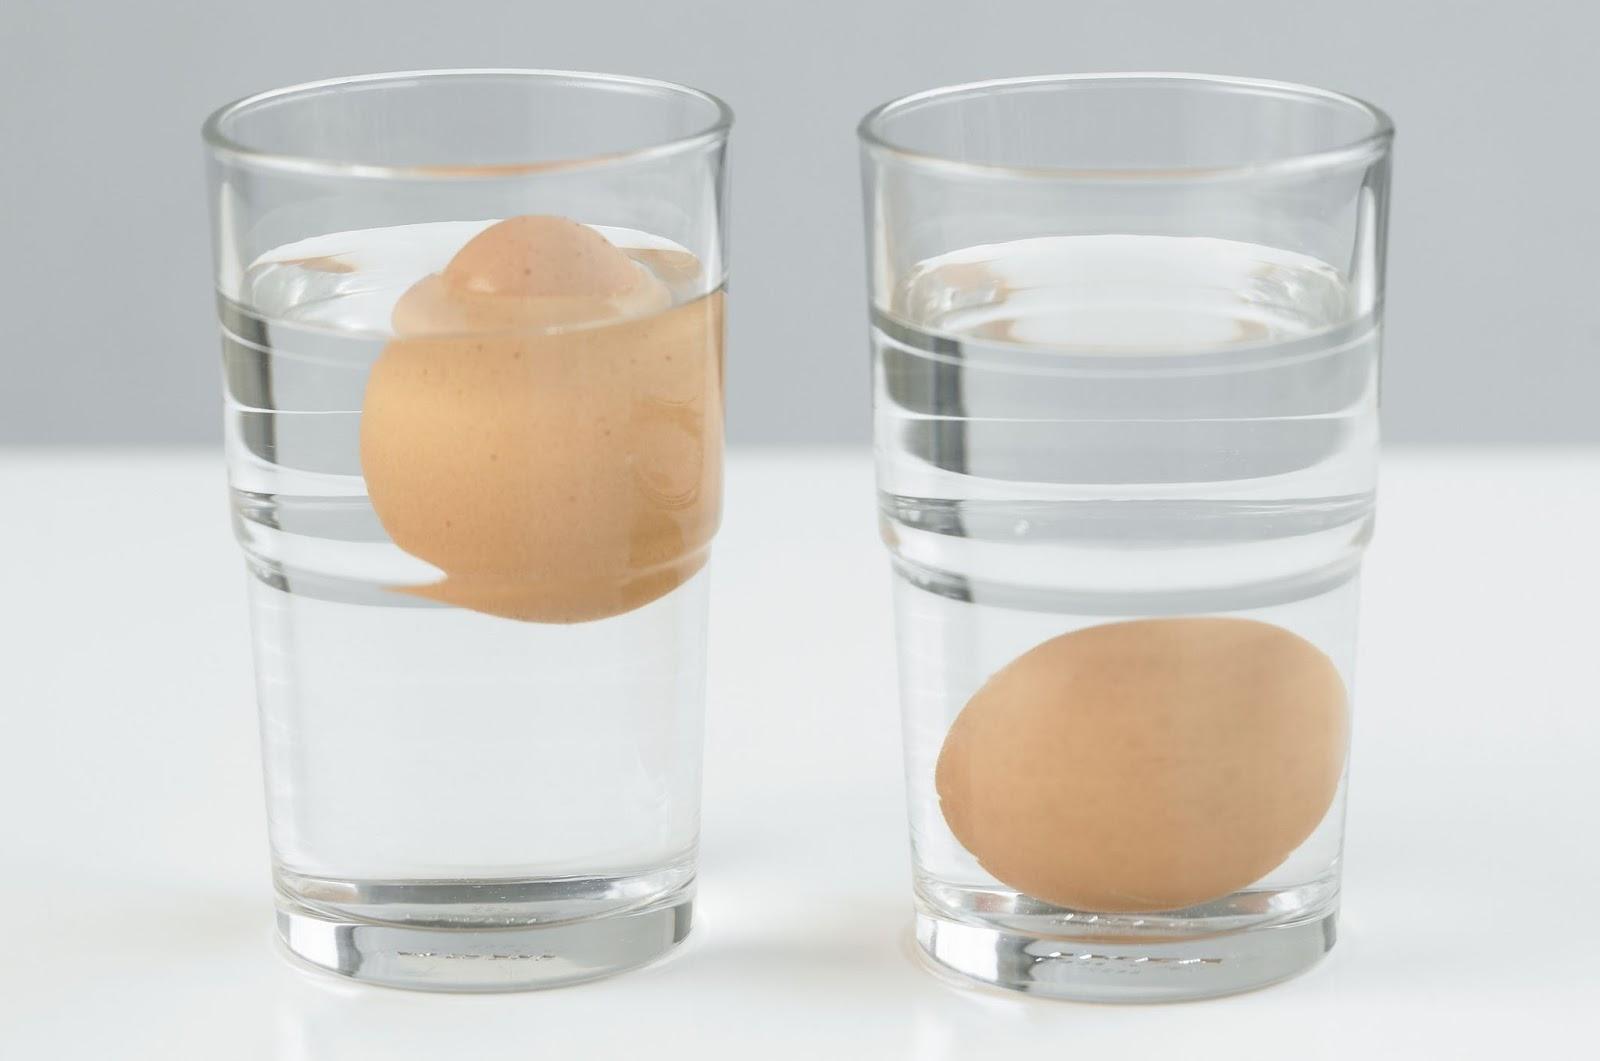 Ketahui Ciri Kualitas Telur Yang Baik Sebelum